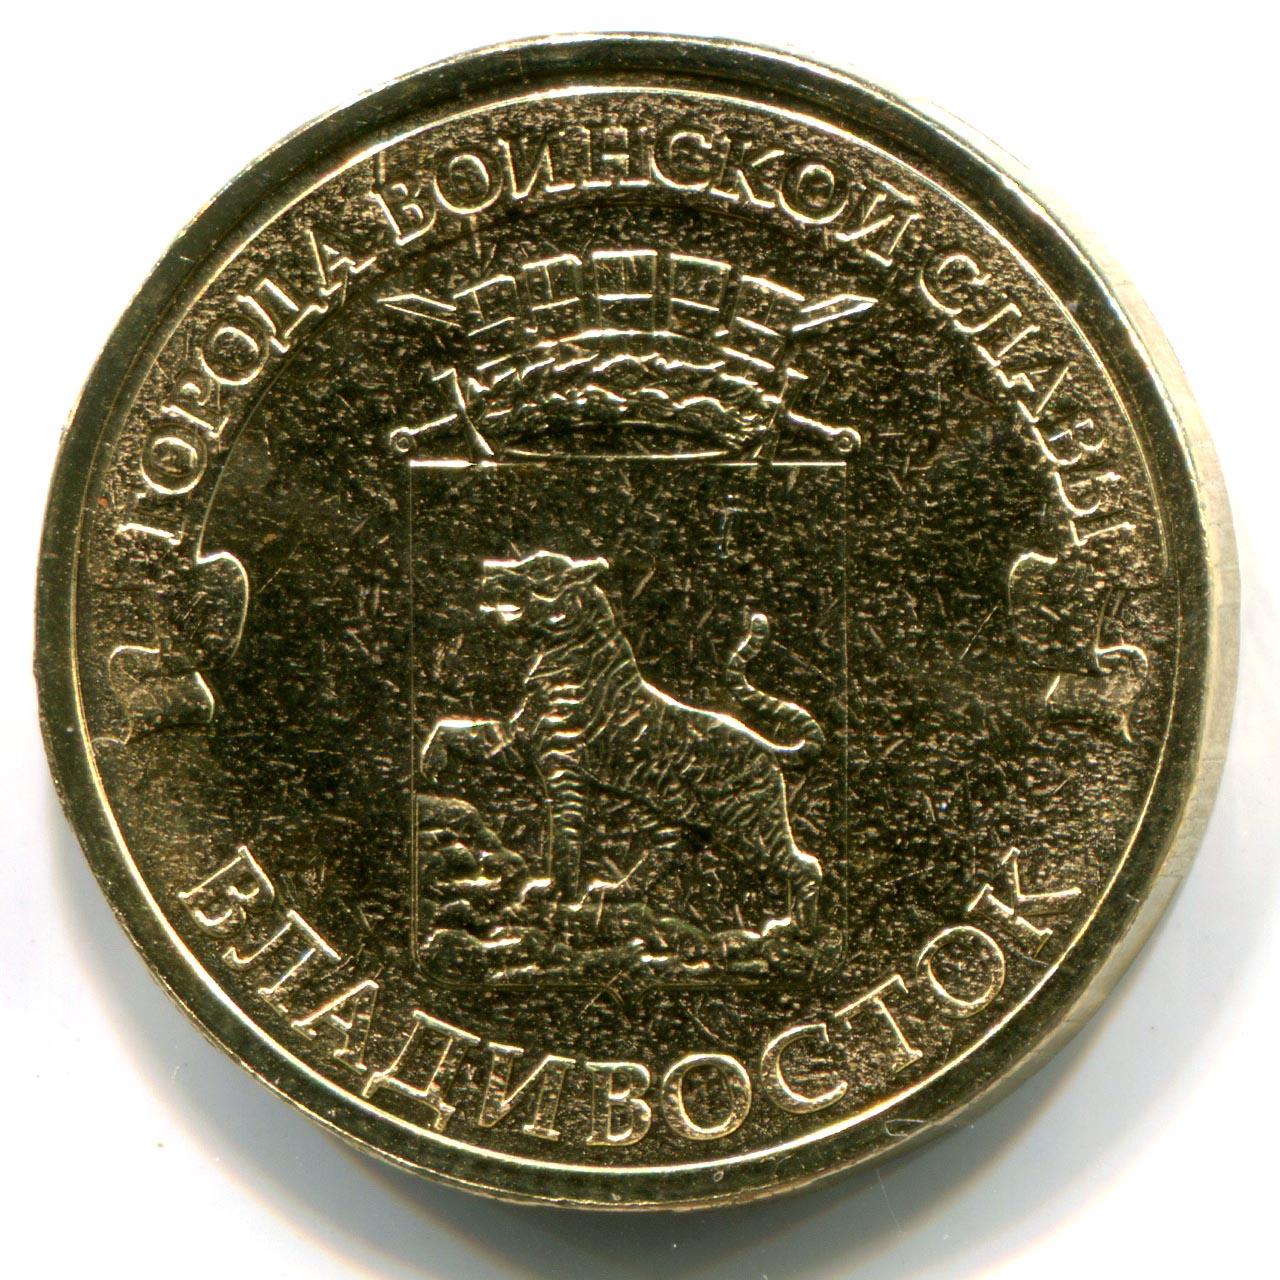 Монета Владивосток 2014 года 10 рублей - реверс